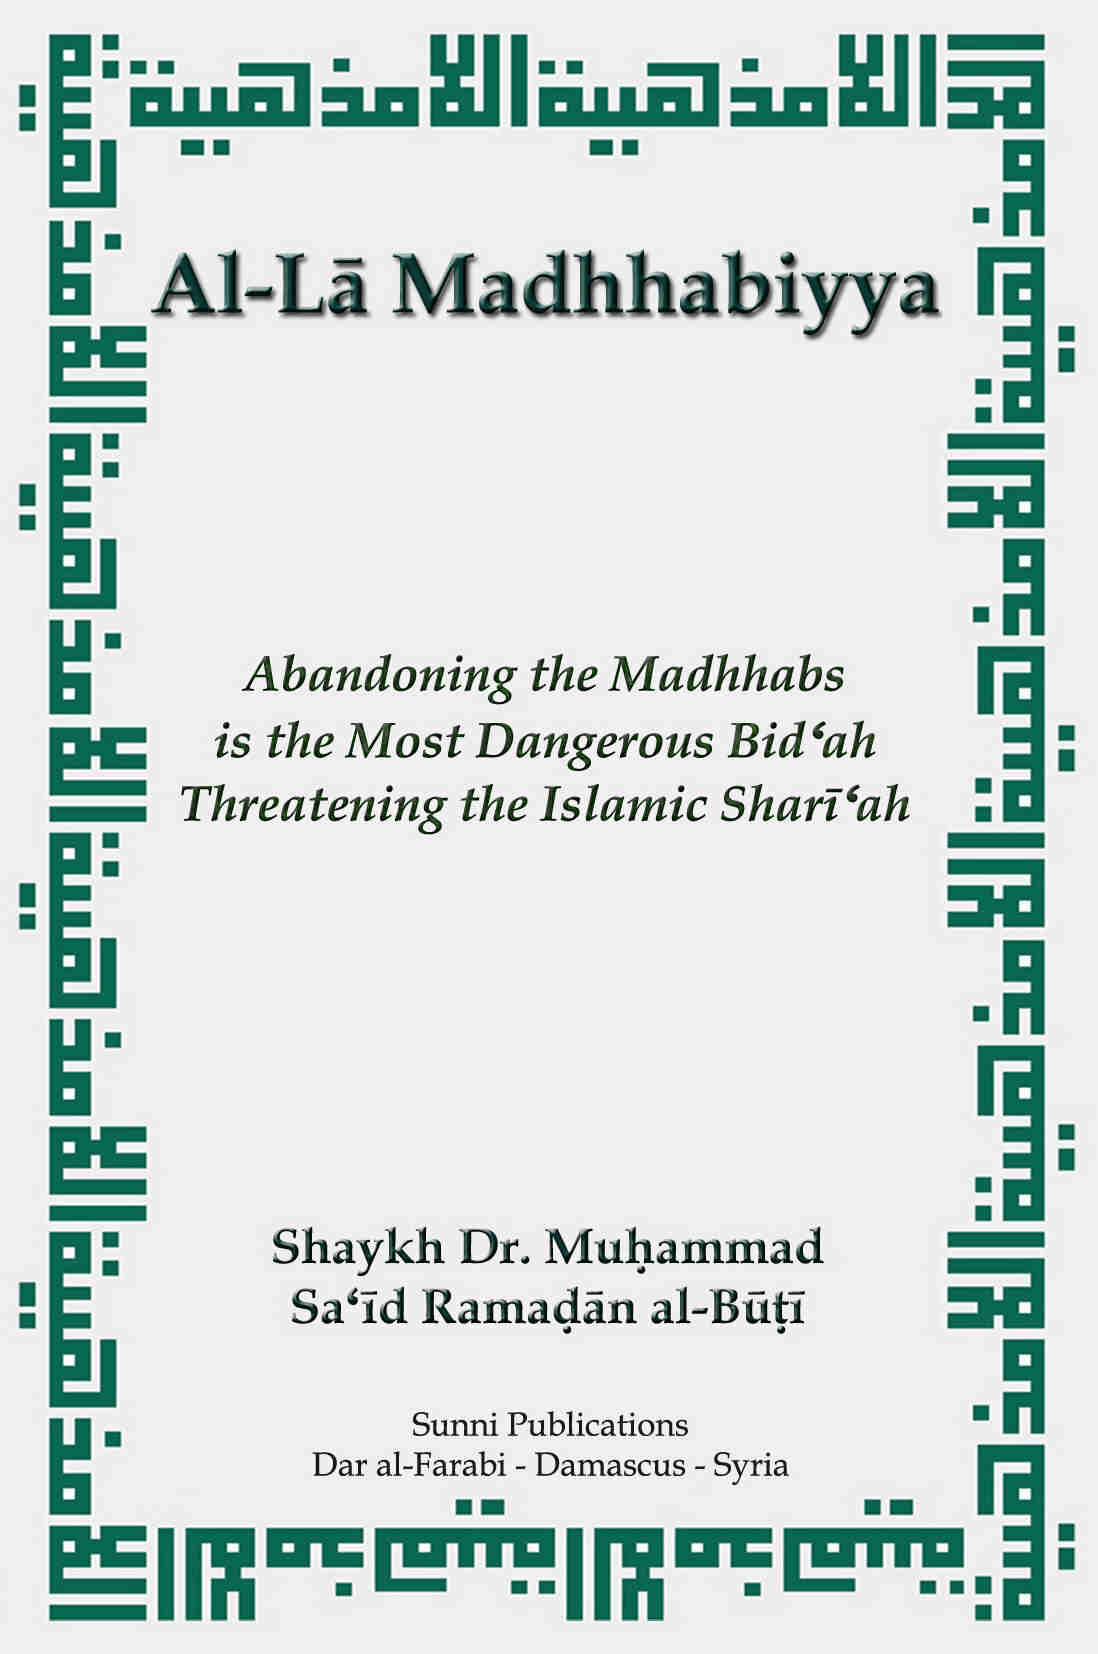 Oordeel volgen van een wetschool - al-la madhhabiyyah